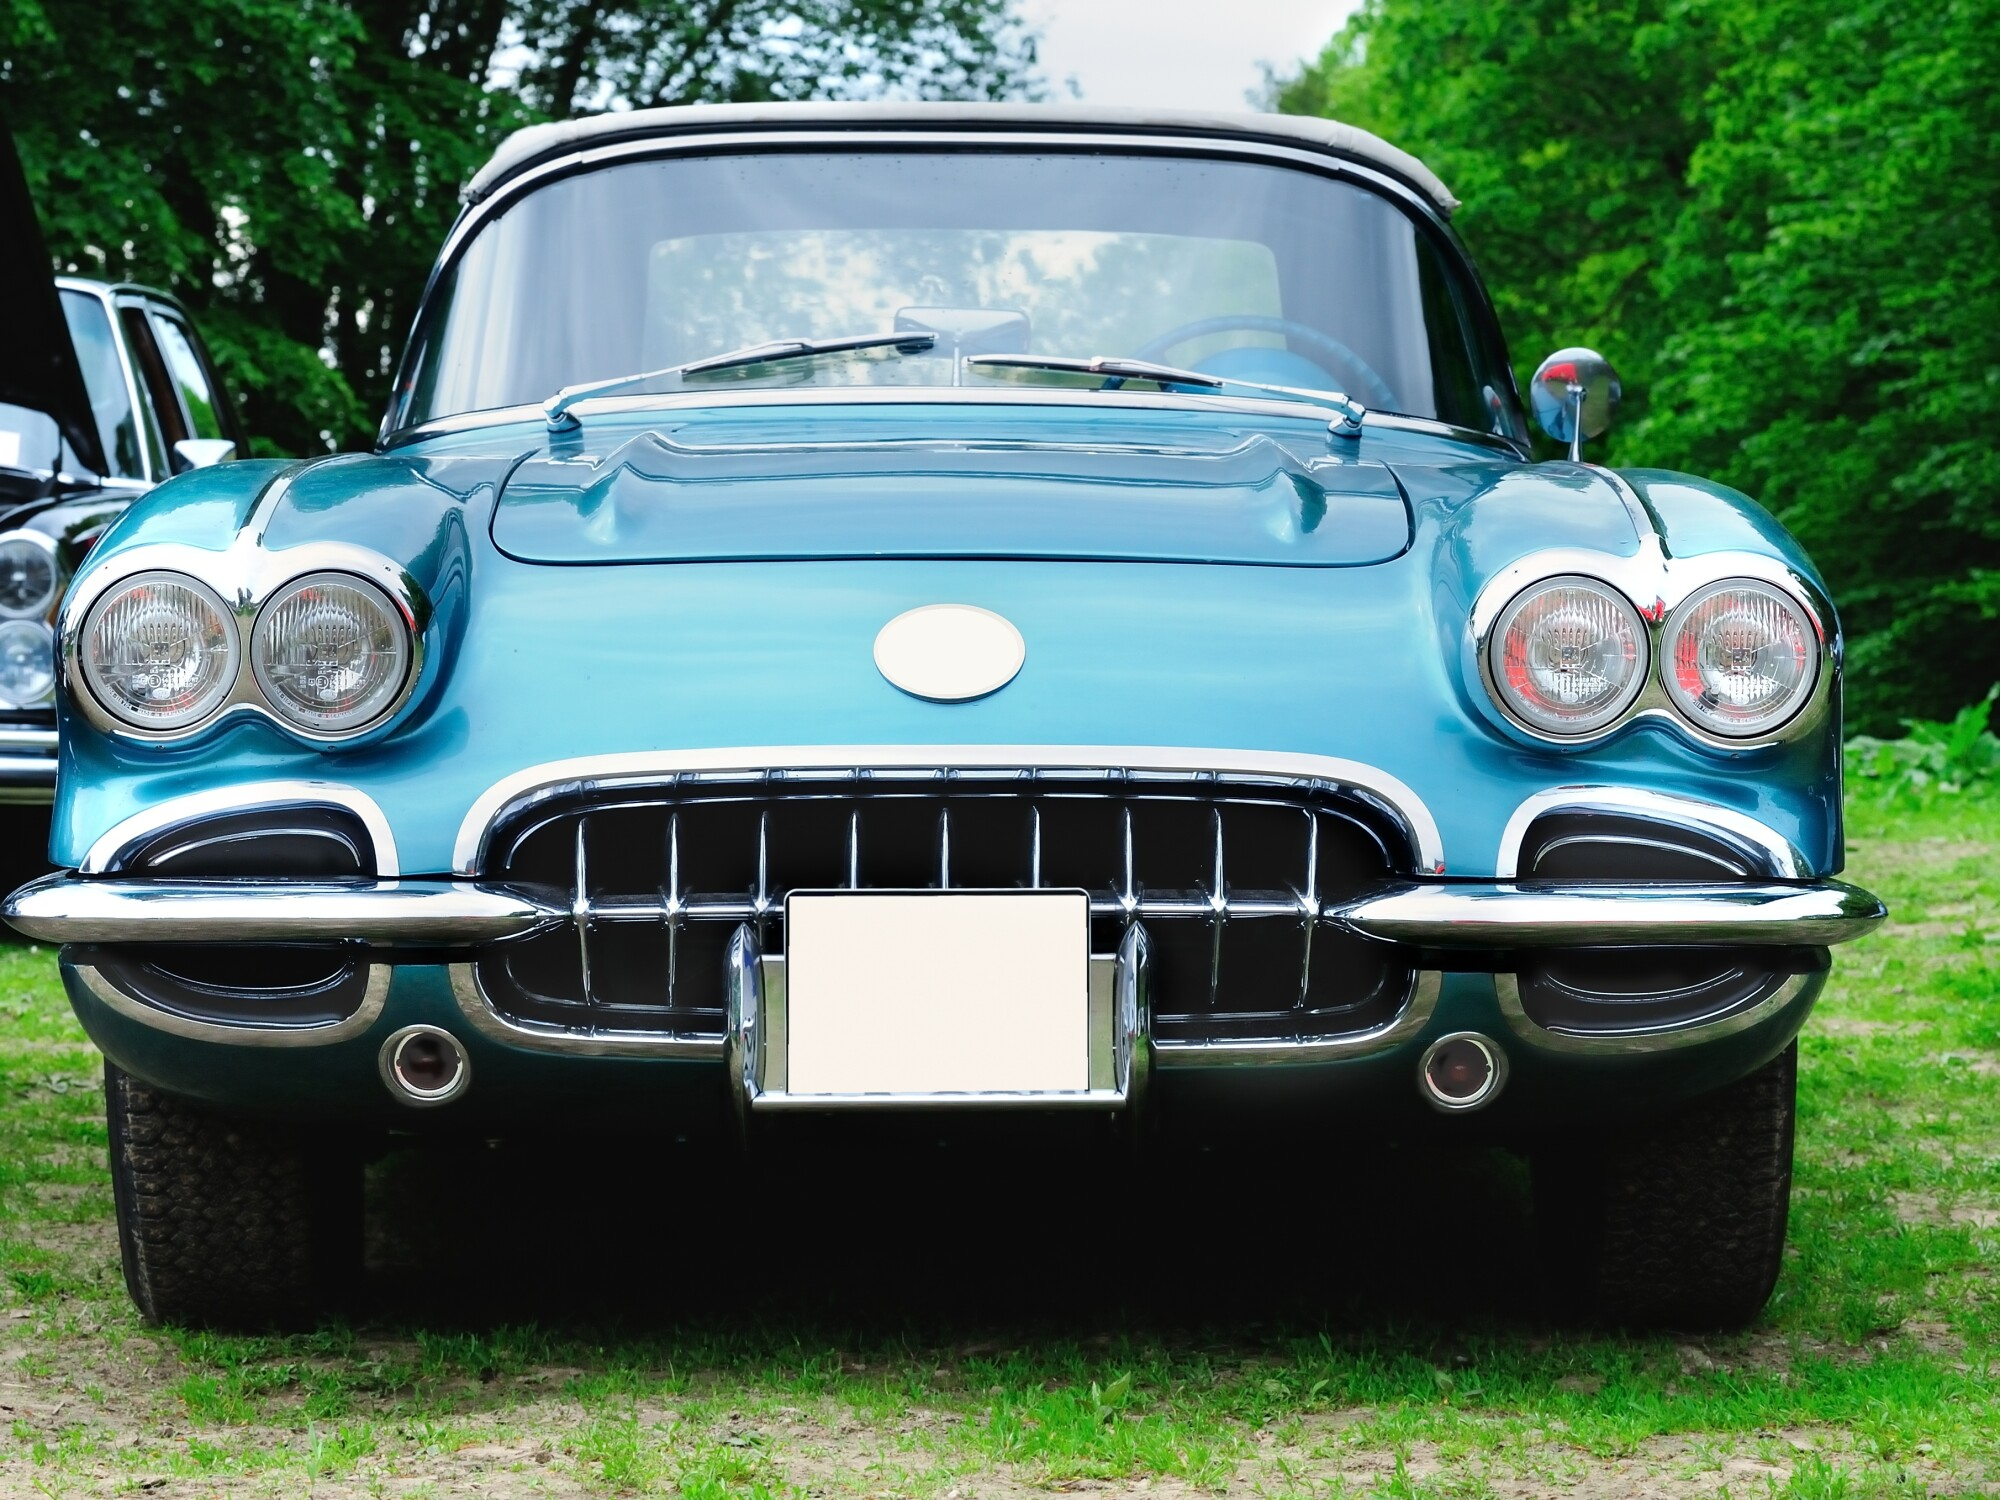 Value of a Classic Car